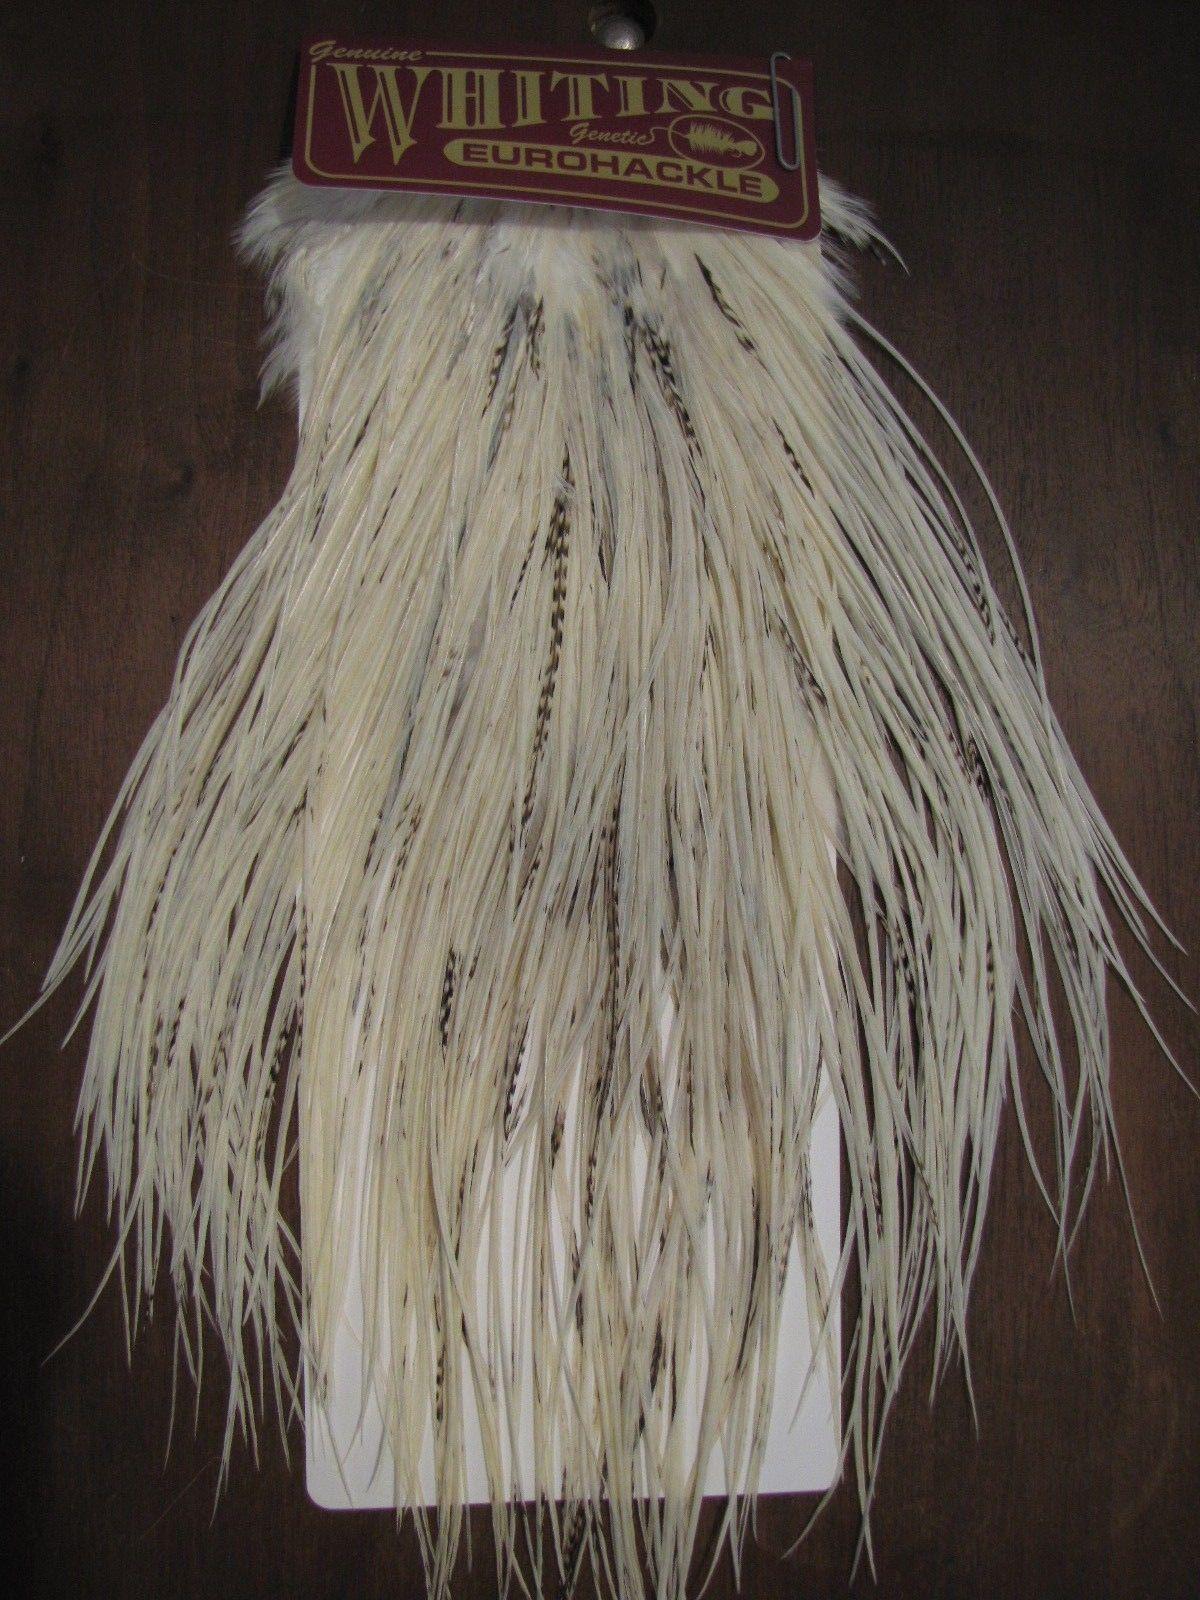 Angelsport-Fliegen-Bindematerialien Angelsport-Artikel Fly Tying Whiting Gold Rooster Saddle White #D